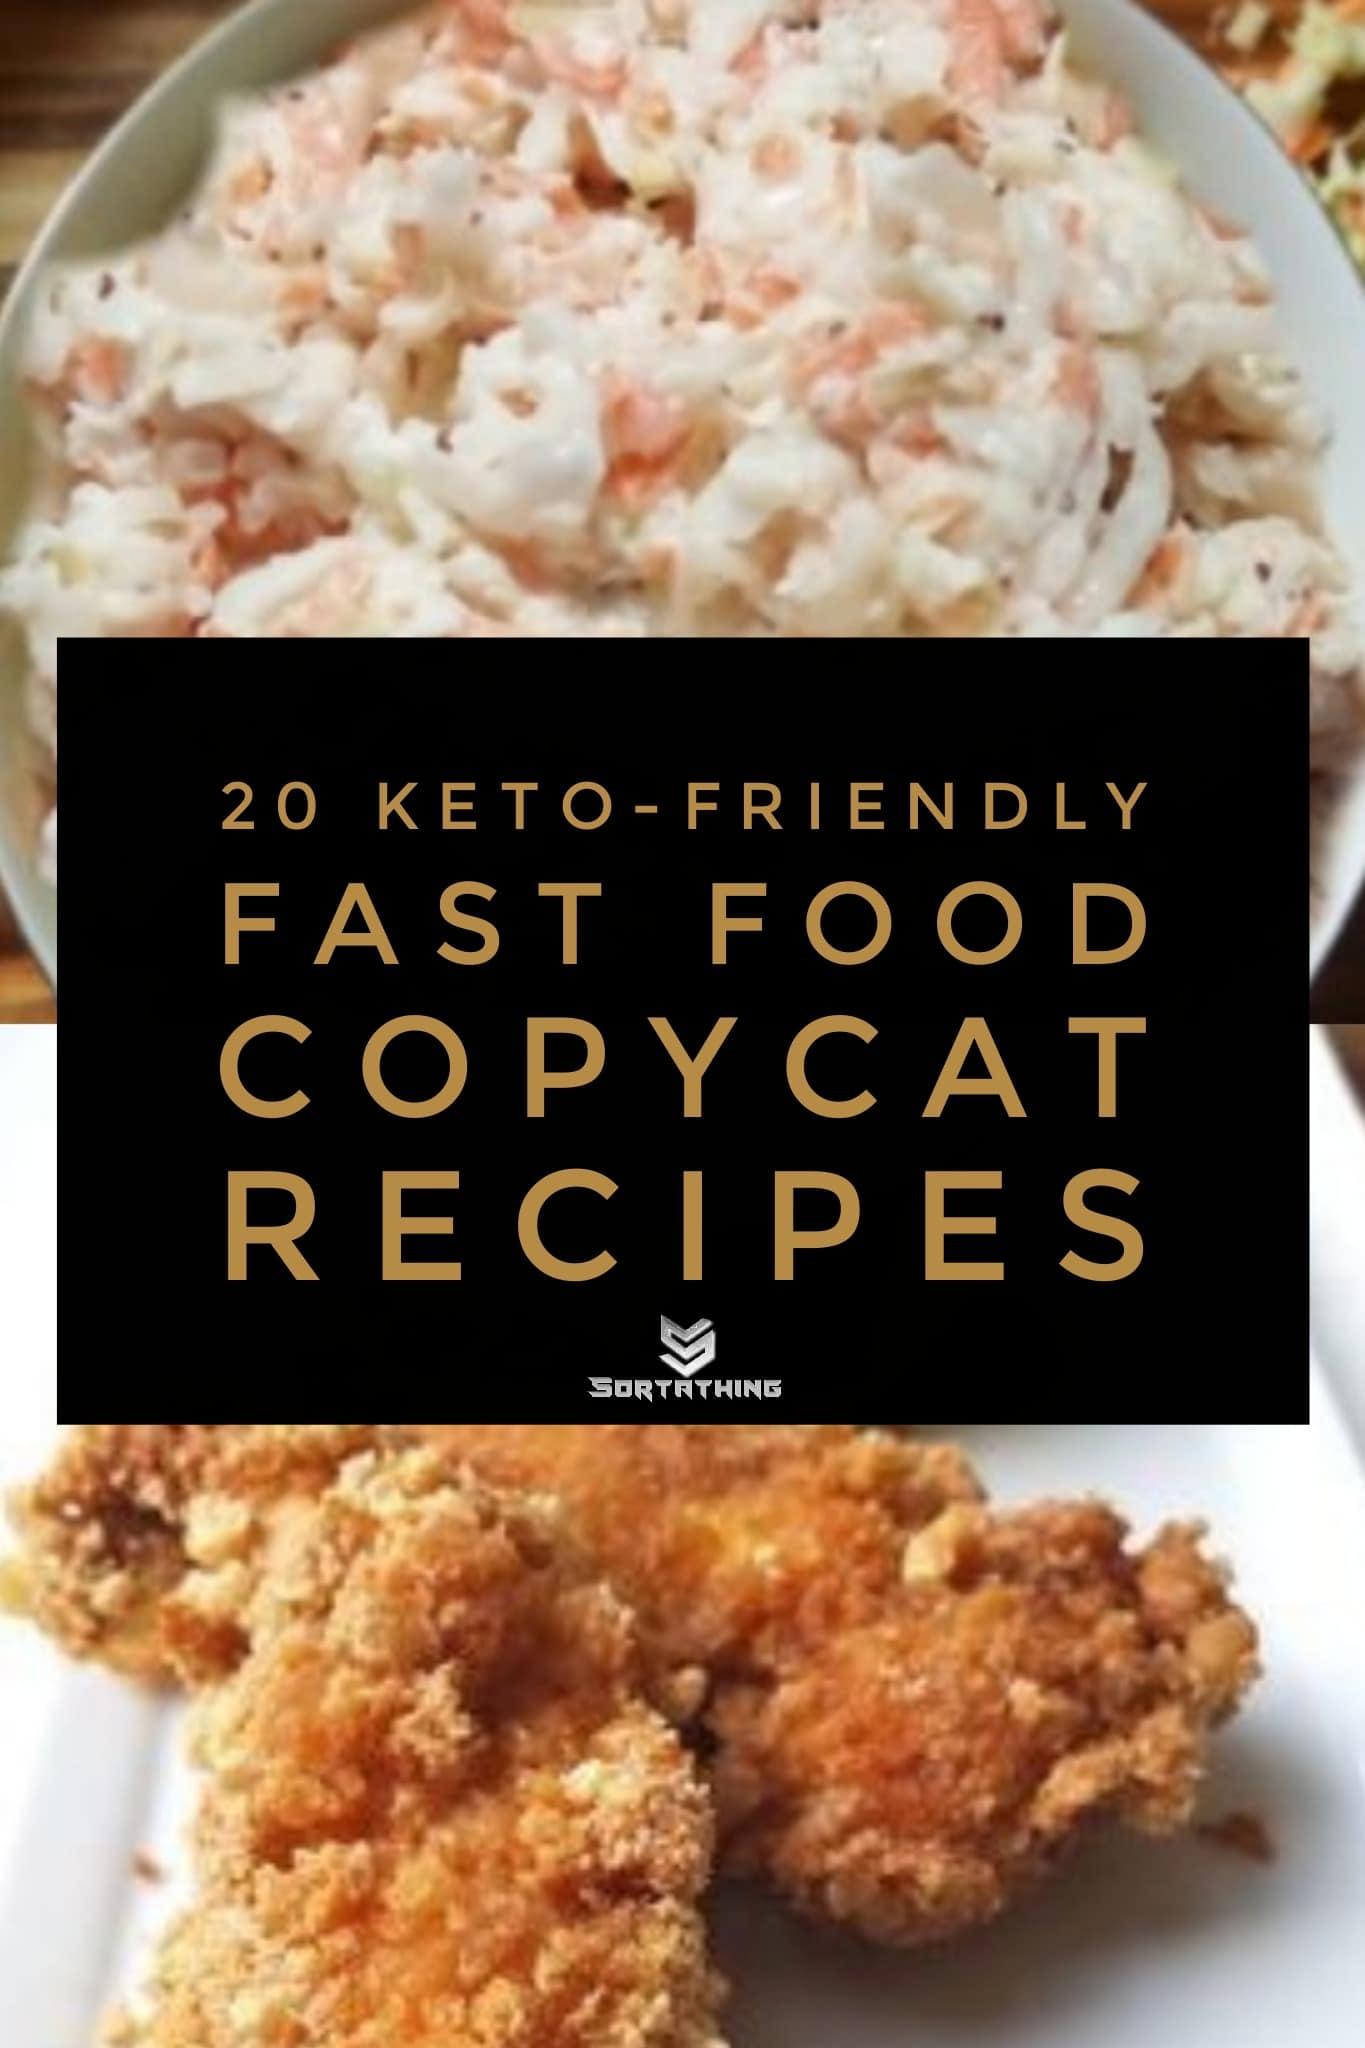 Keto KFC Copycat Coleslaw & Chick-Fil-A Tenders